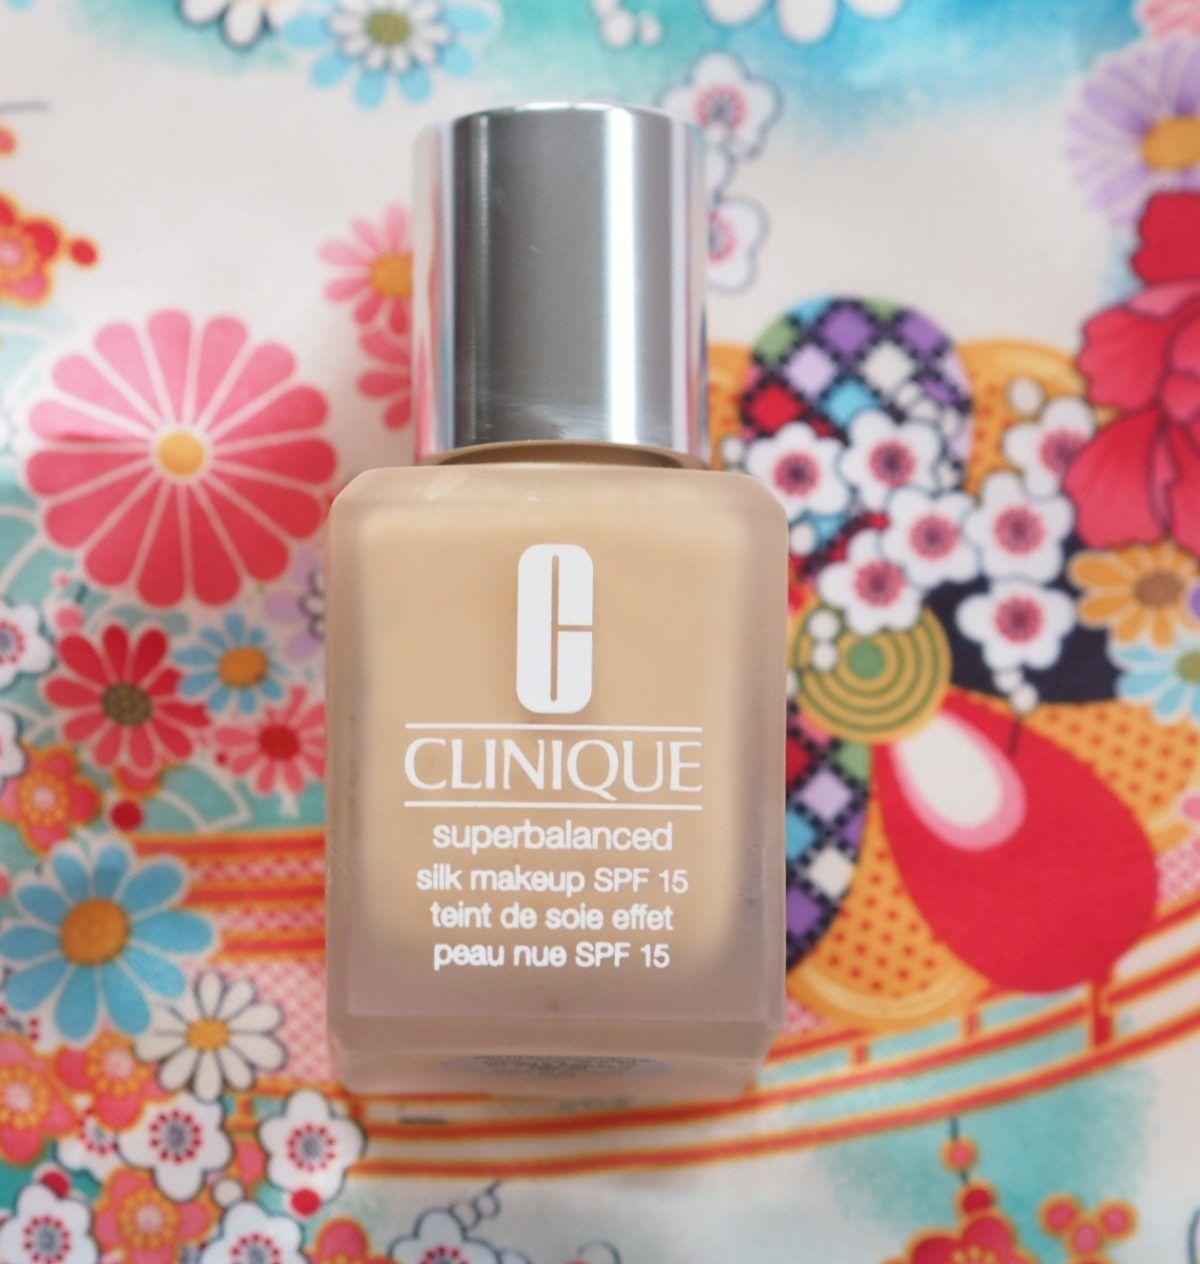 Clinique Superbalanced Silk Makeup SPF15 Makeup needs